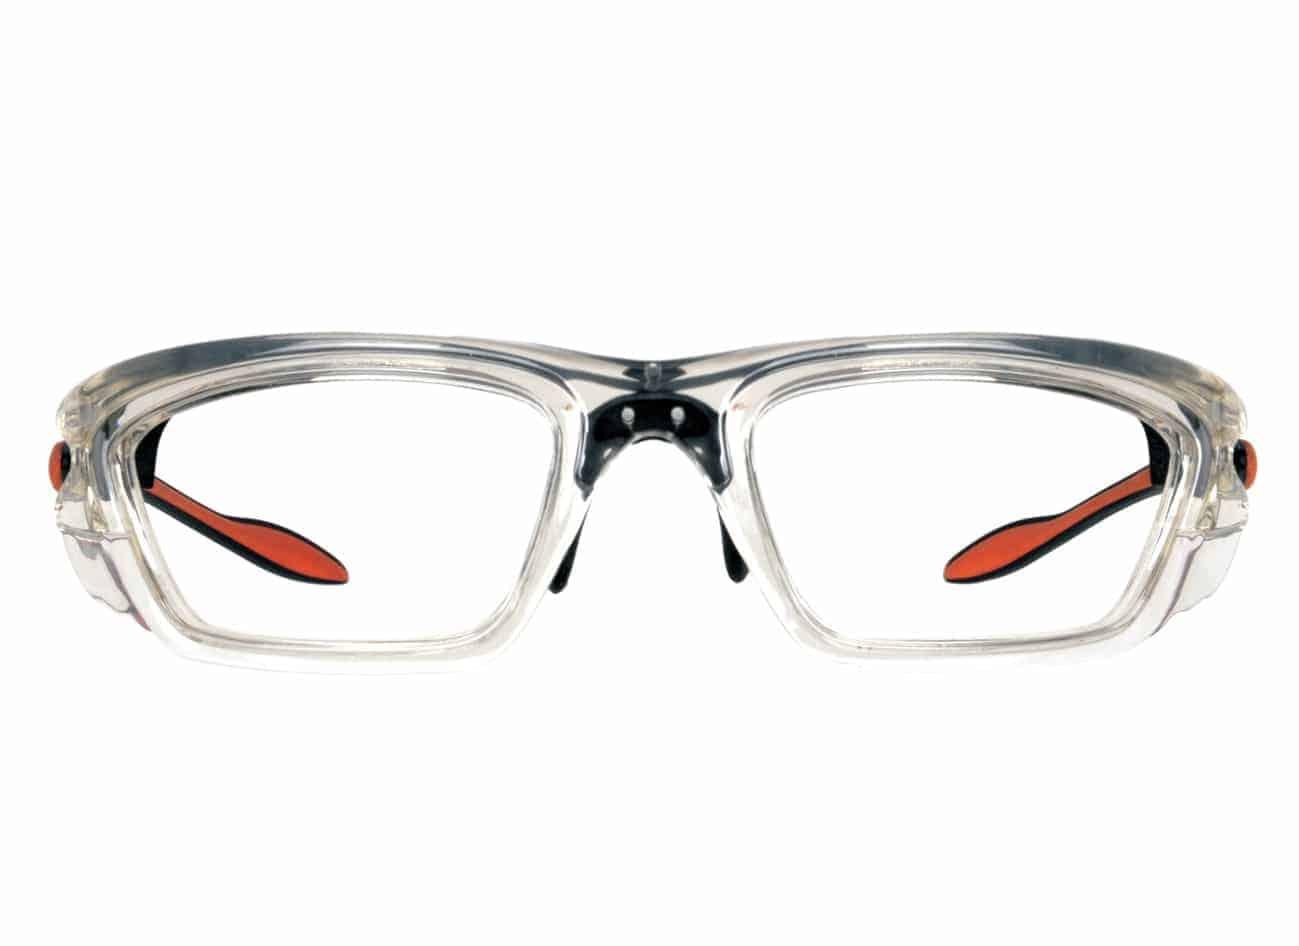 Hudson Optical / H1 Safety Glasses | E-Z Optical